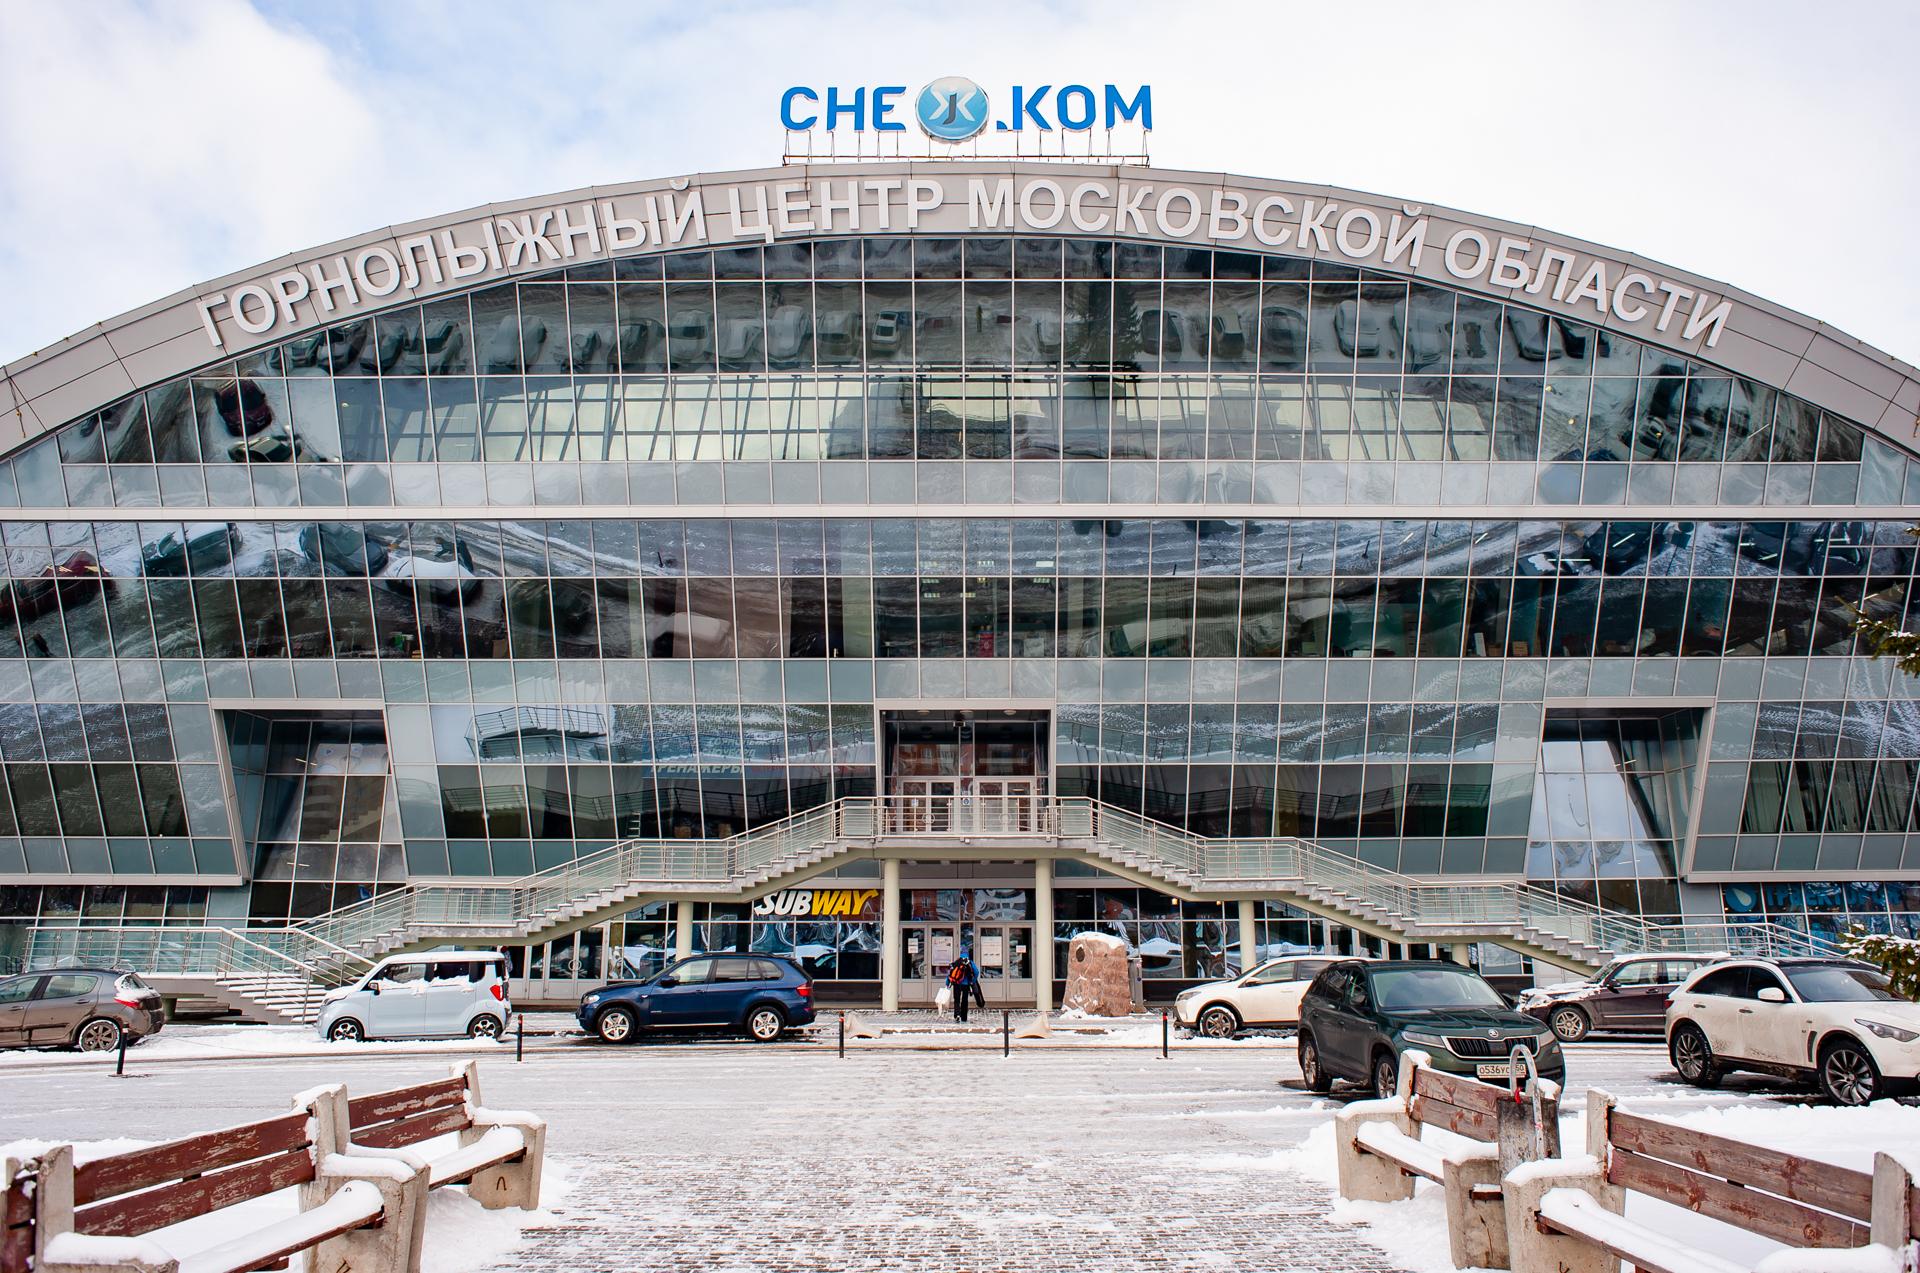 Красногорск, СНЕЖ.КОМ